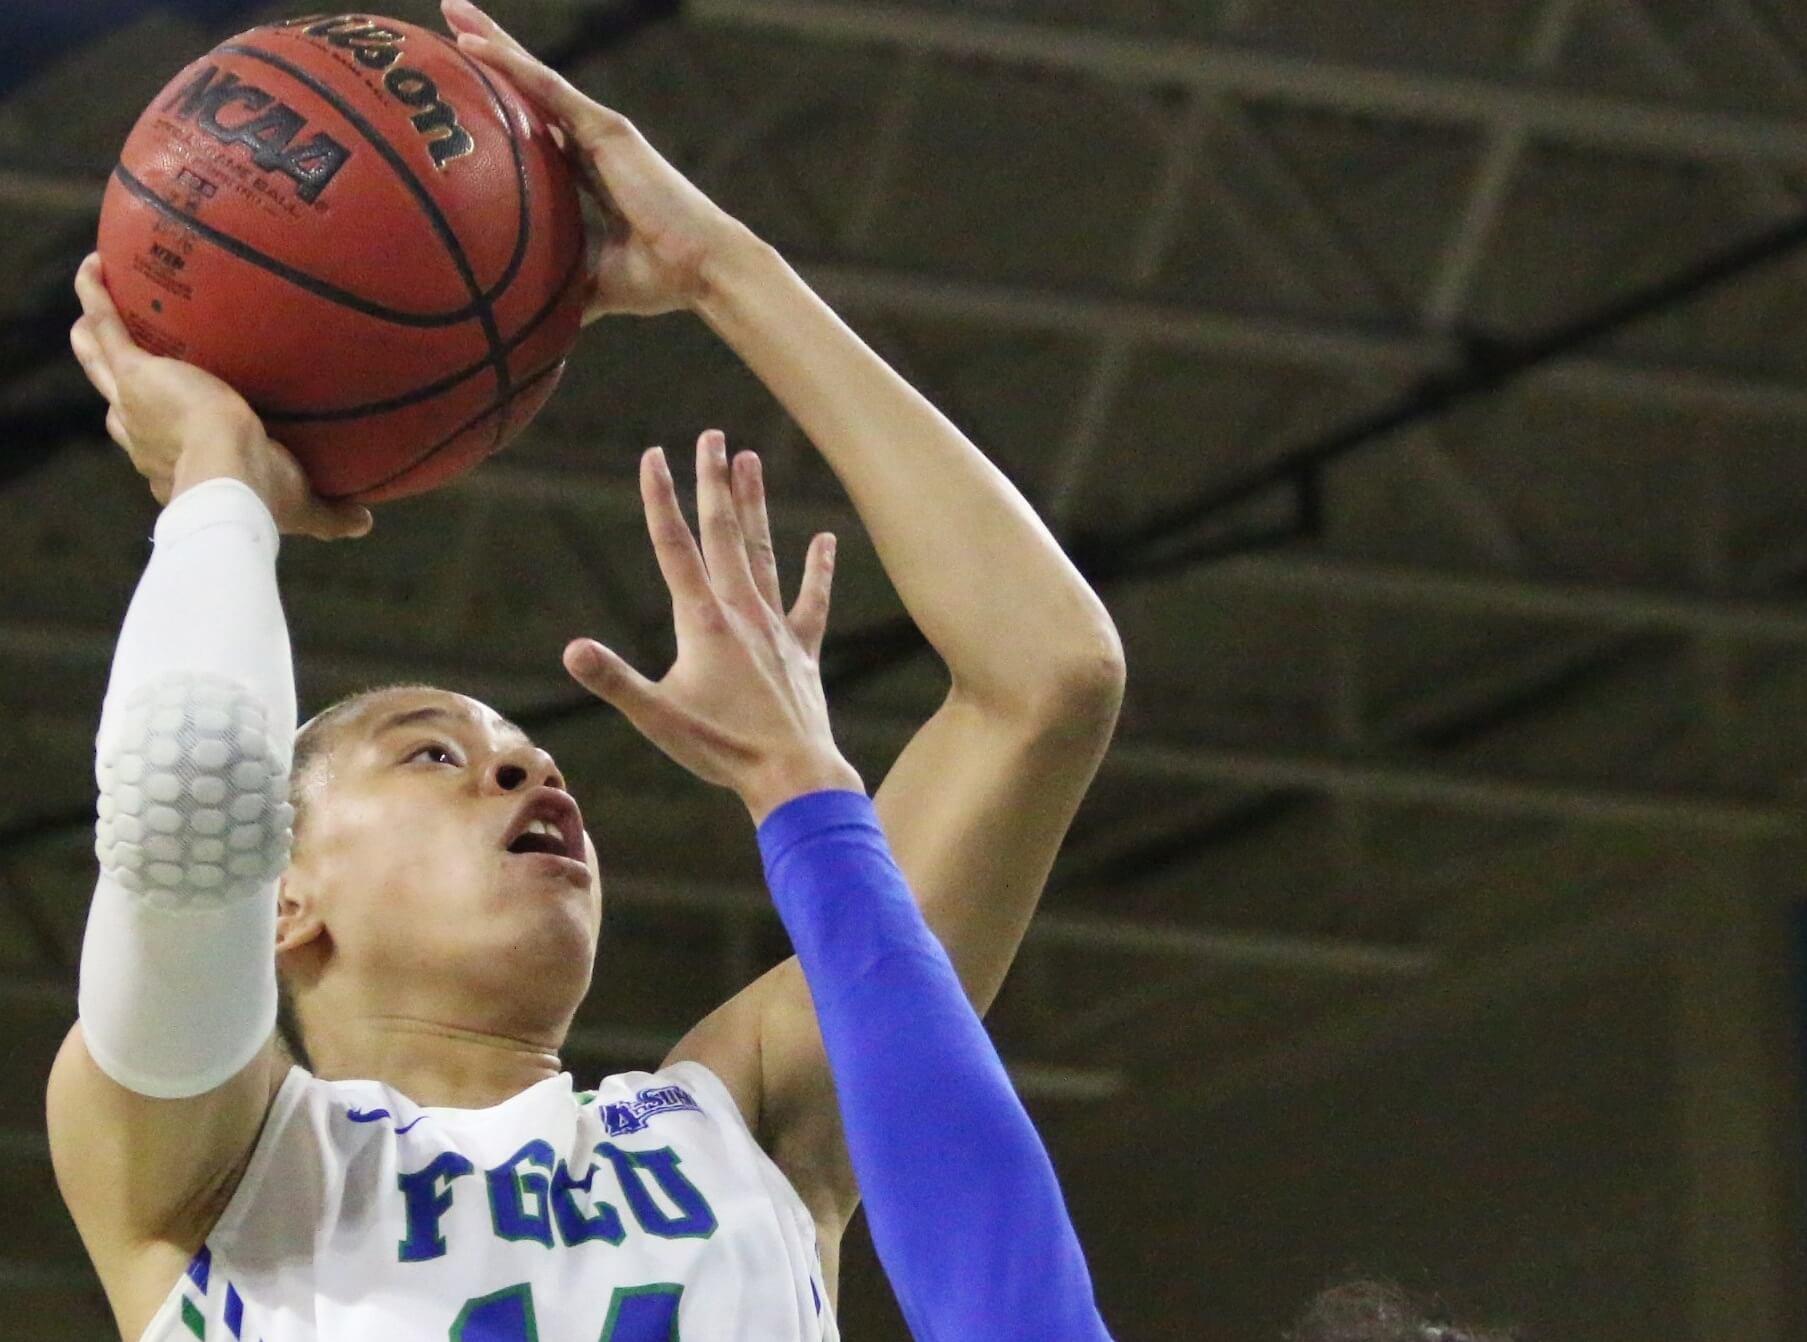 FGCU's Whitney Knight up for WNBA draft